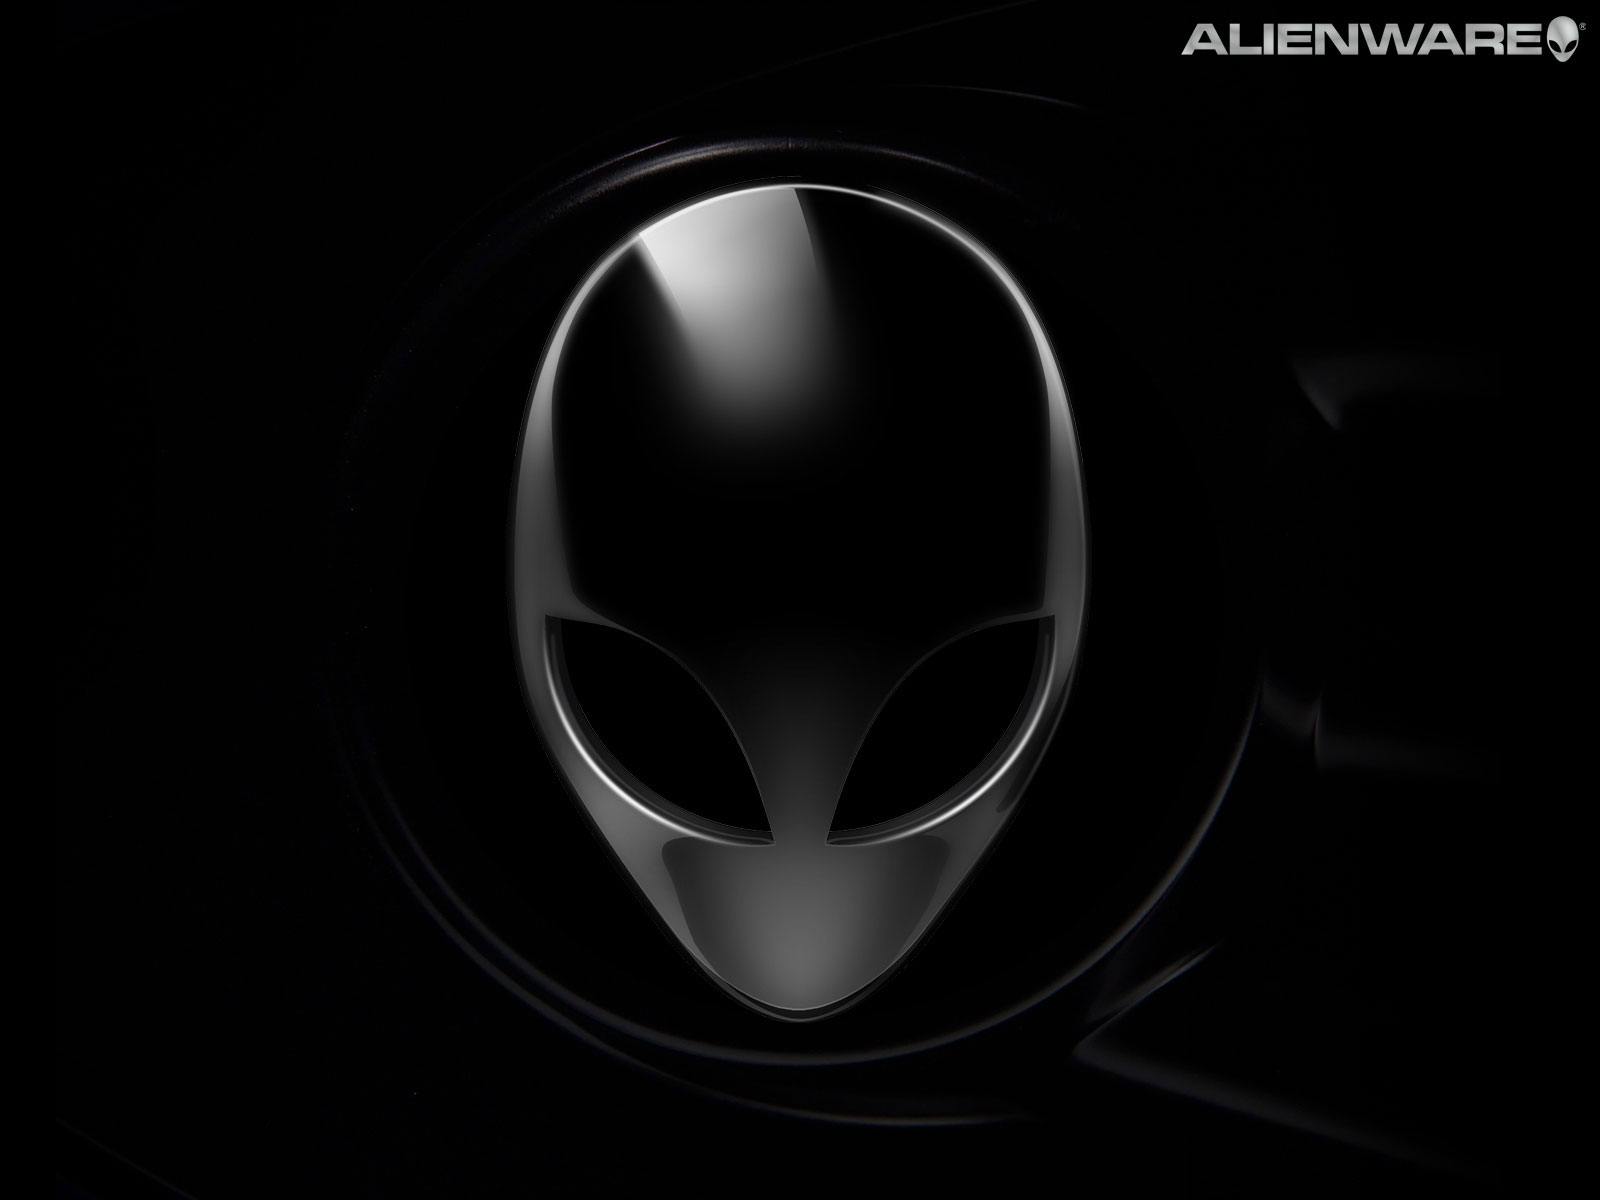 Alienware Wallpaper Black Head Wallpaper Desktop HD Download 1600x1200